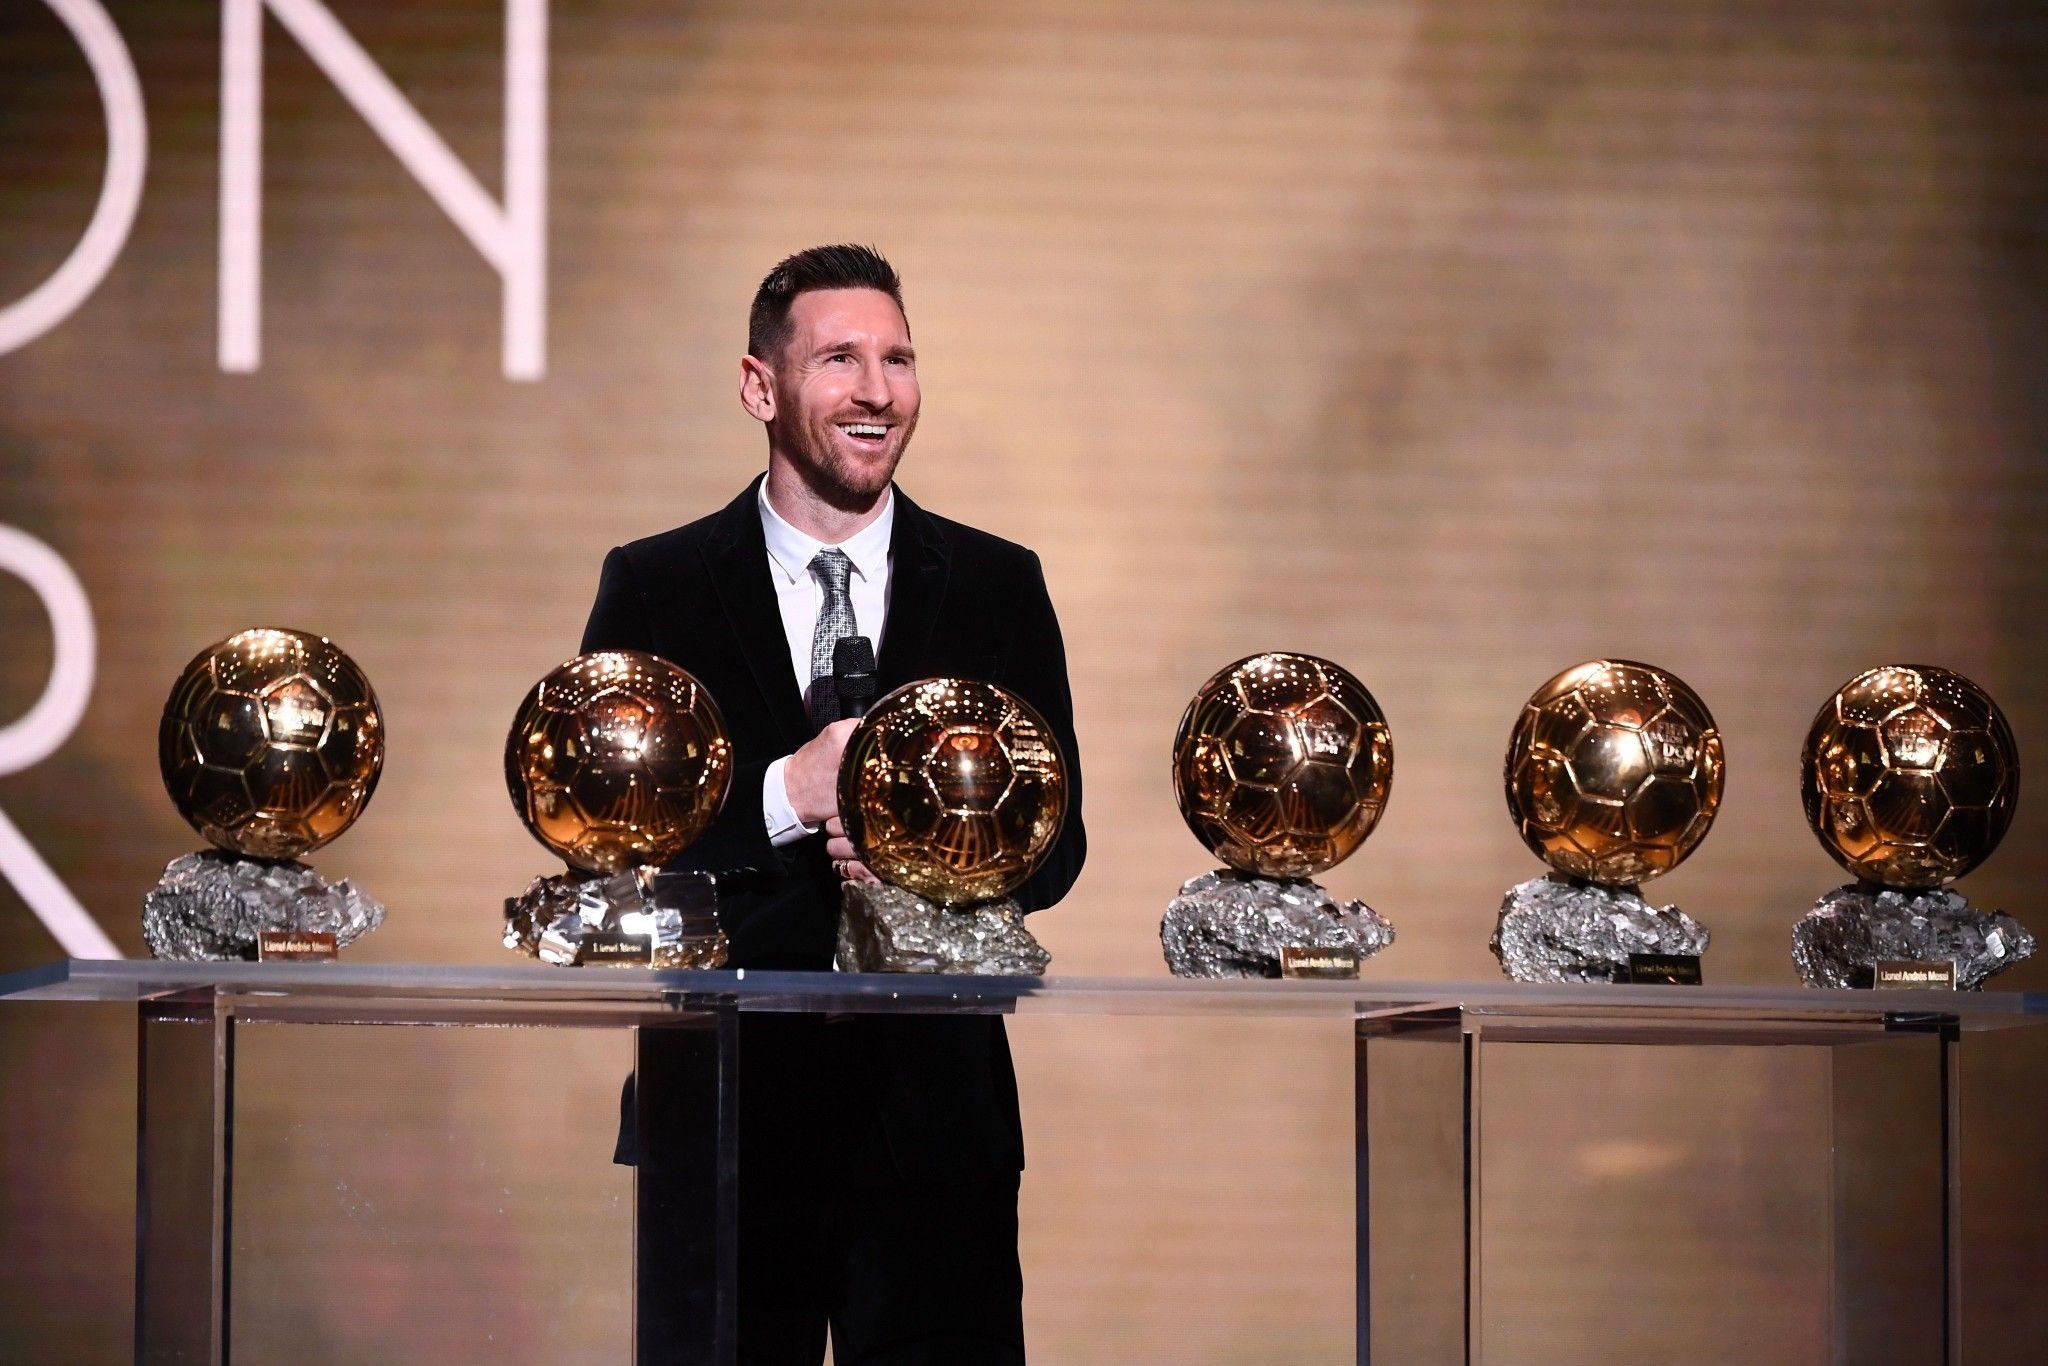 Pin By Cristiamjaaziel On Leo Messi Messi Messi And Ronaldo Messi Soccer